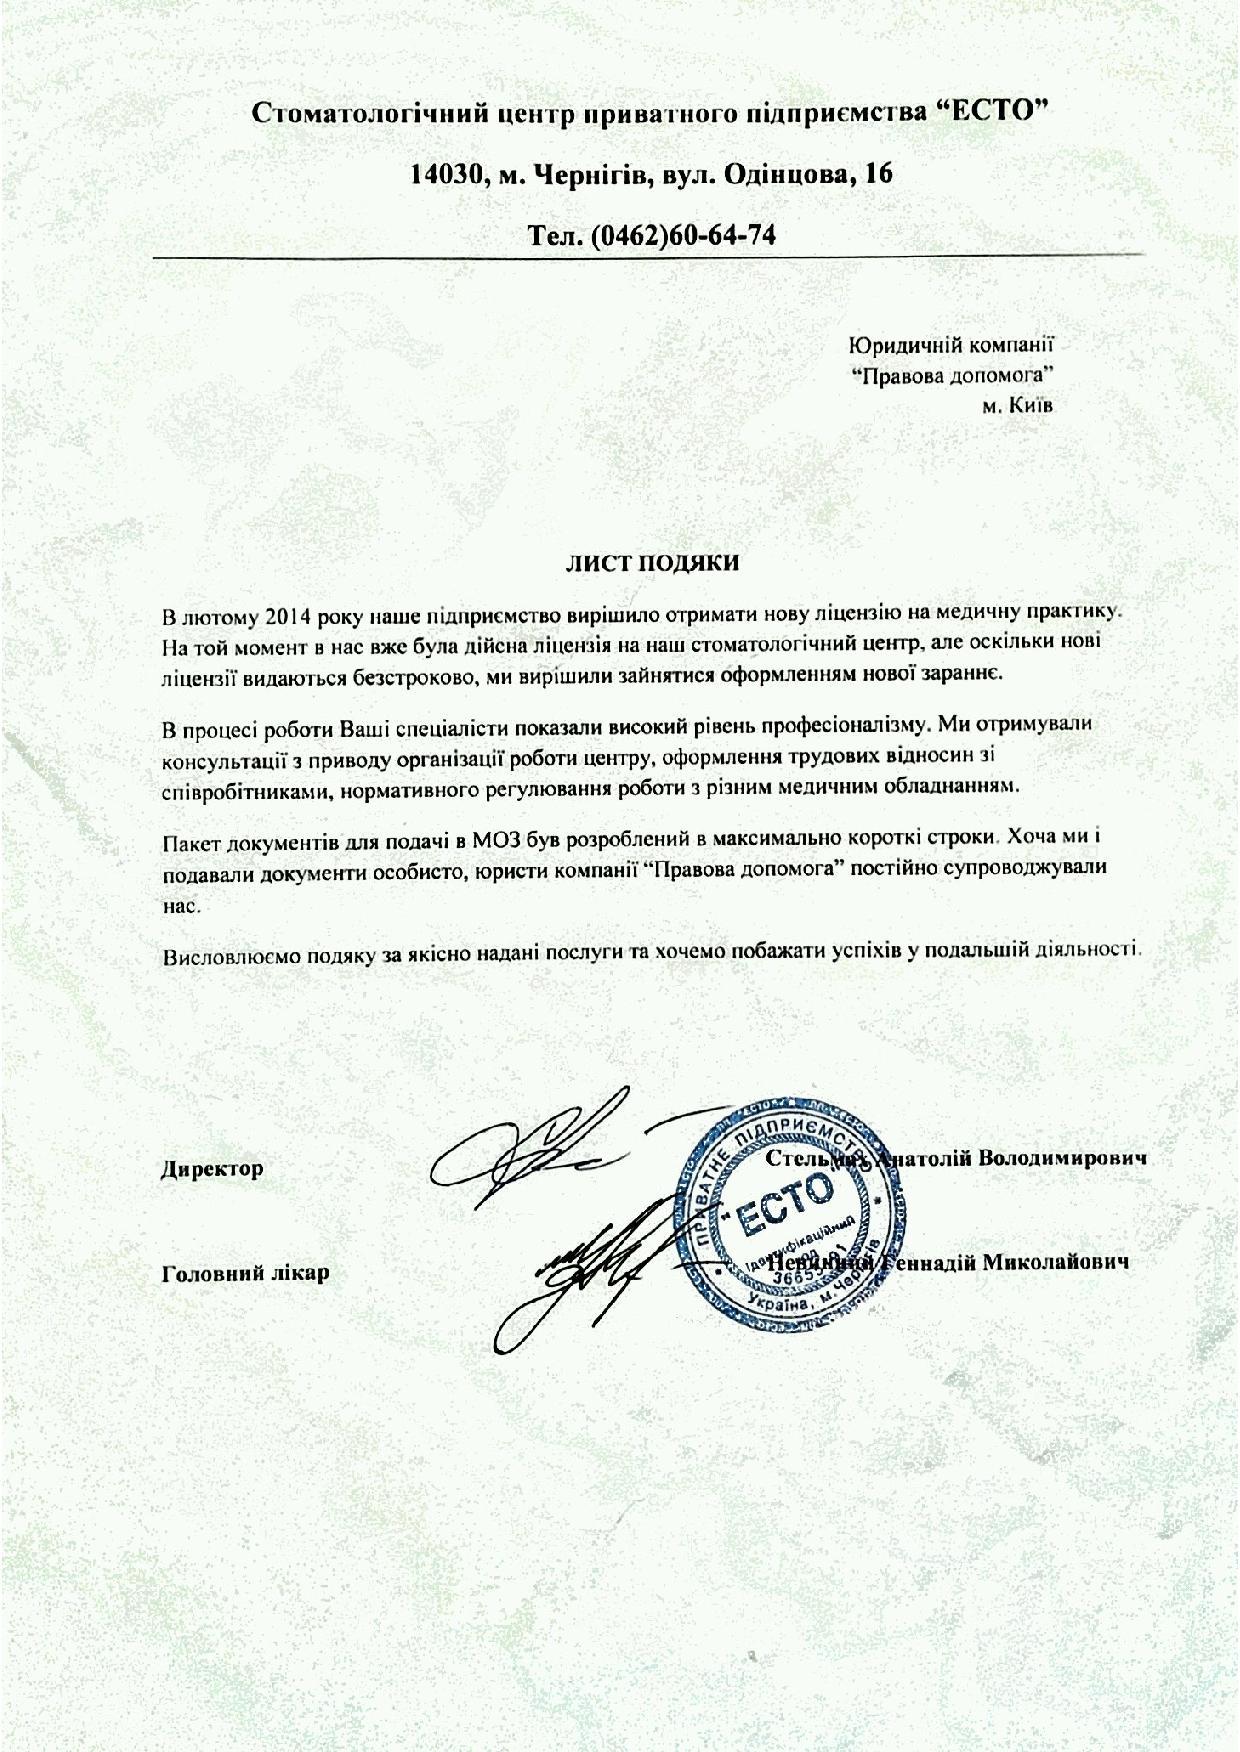 бланк направления на медосмотр от предприятия в украине